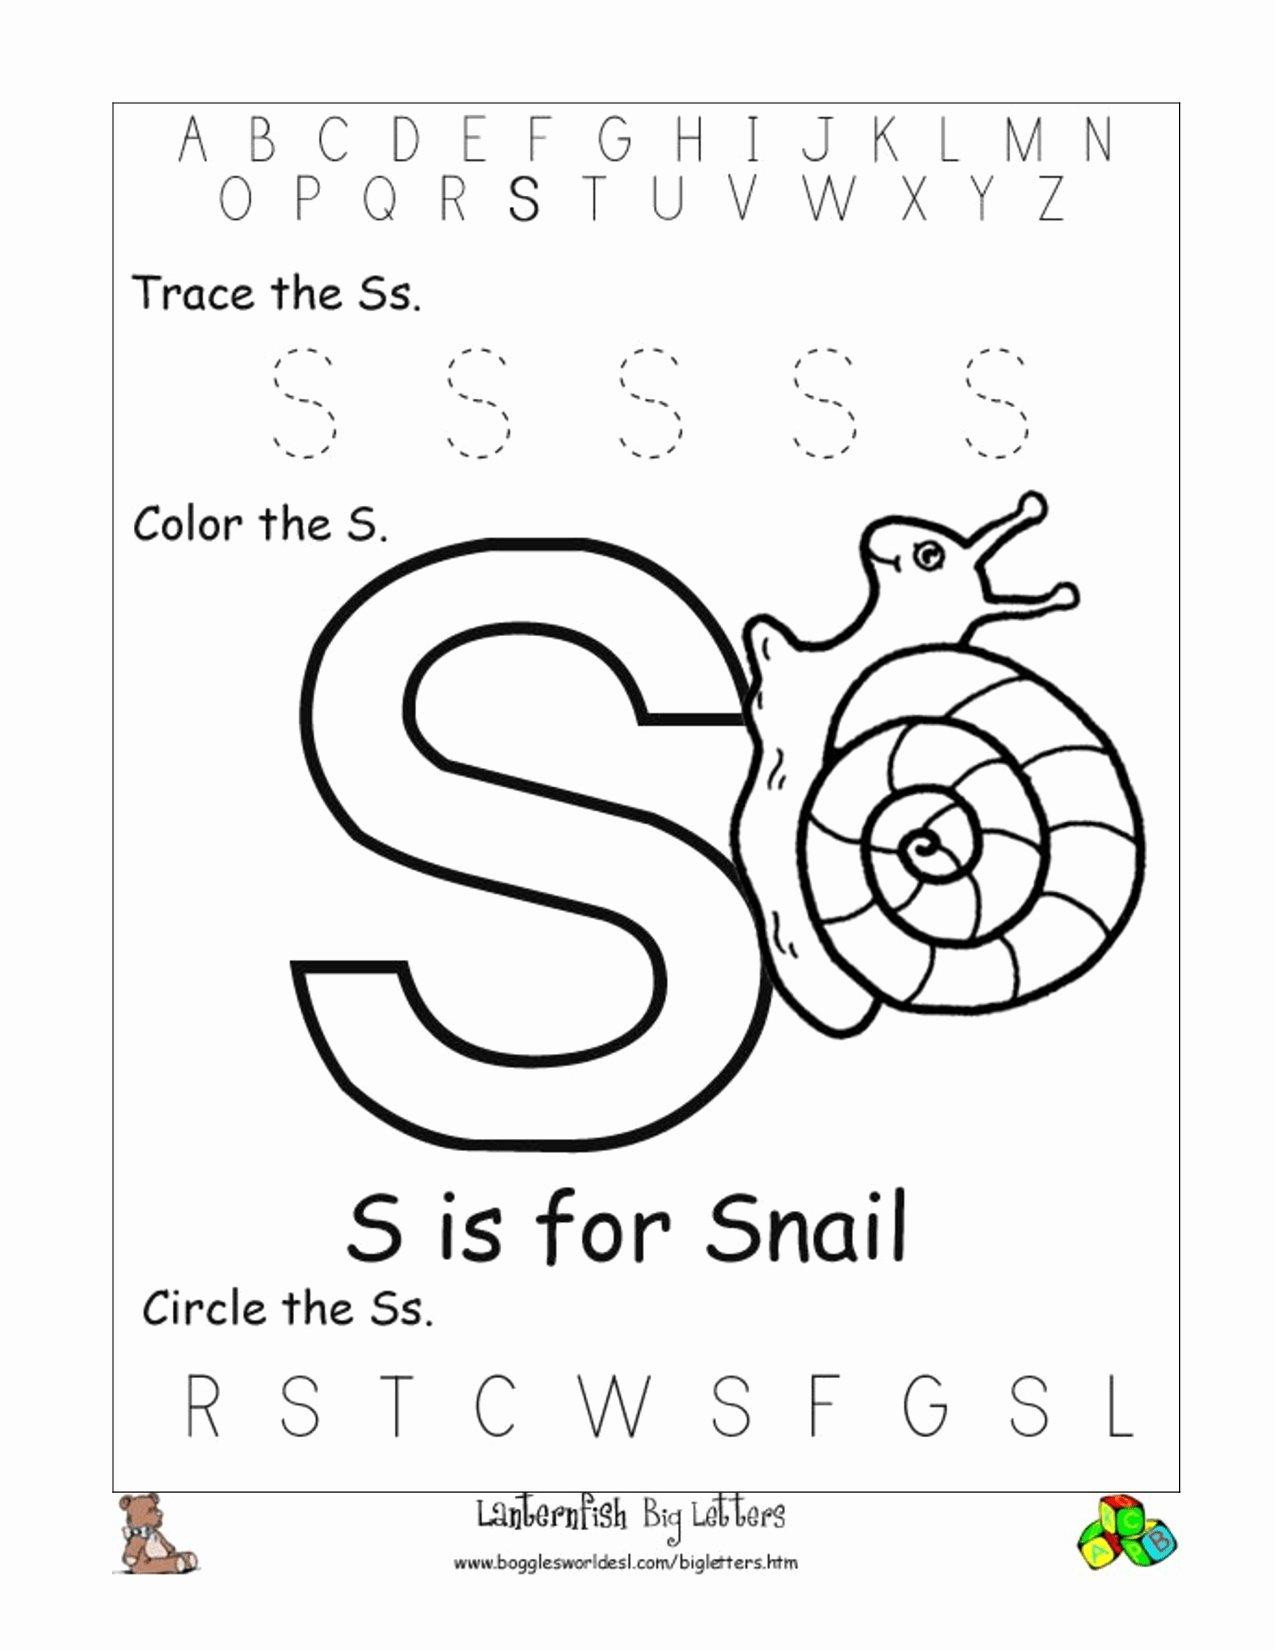 Letter S Worksheets for Preschoolers Fresh Worksheets Worksheet Junior Kg Printable Worksheets and